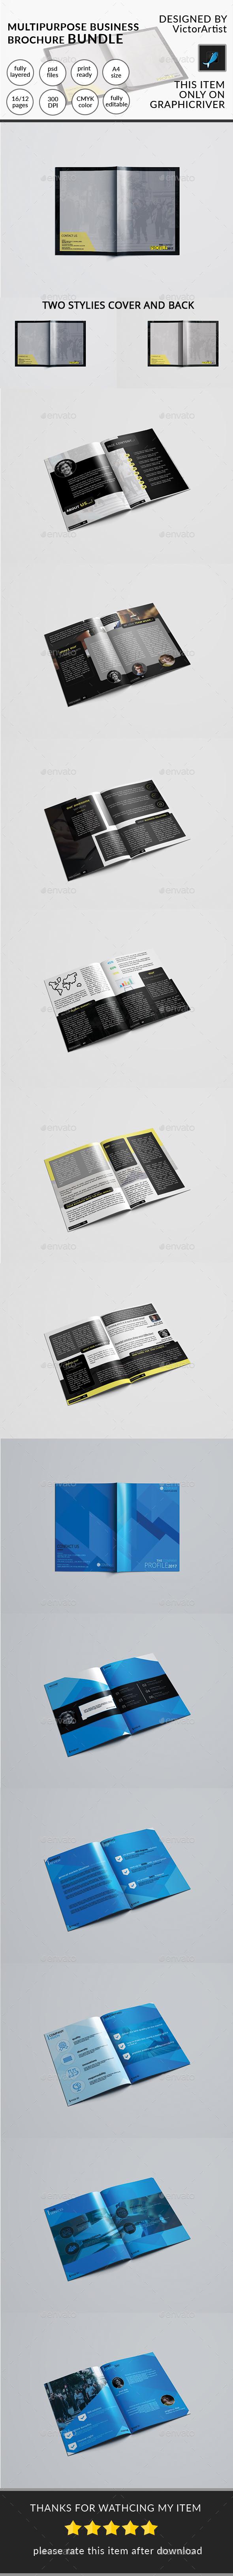 Company Brochure Bundel - Brochures Print Templates